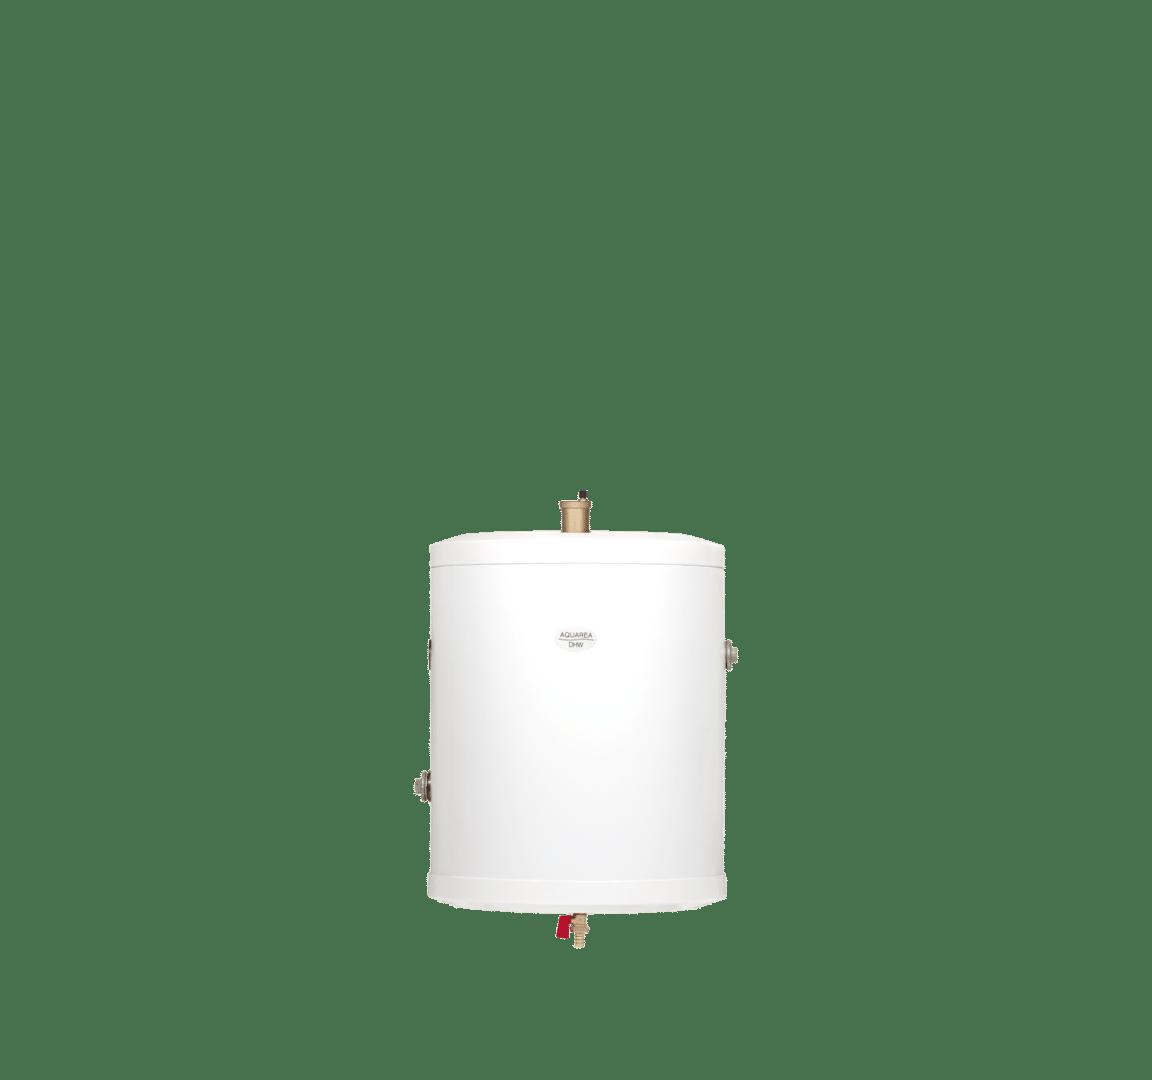 Panasonic warmtepomp buffertank 50 liter rvs van DHPS